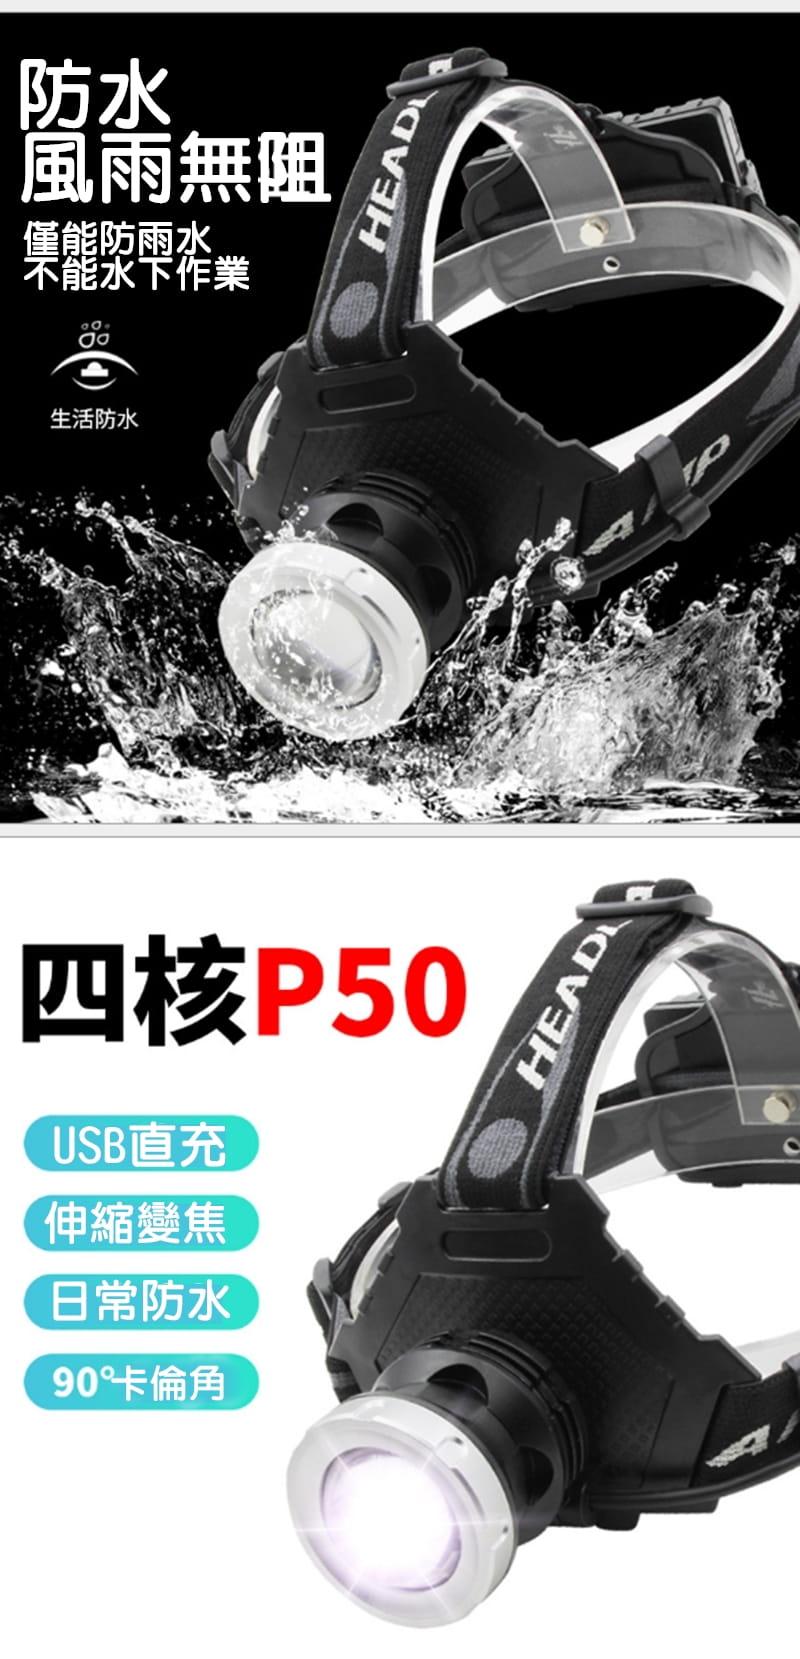 T50型變焦P70頭燈+USB線(單賣) 8